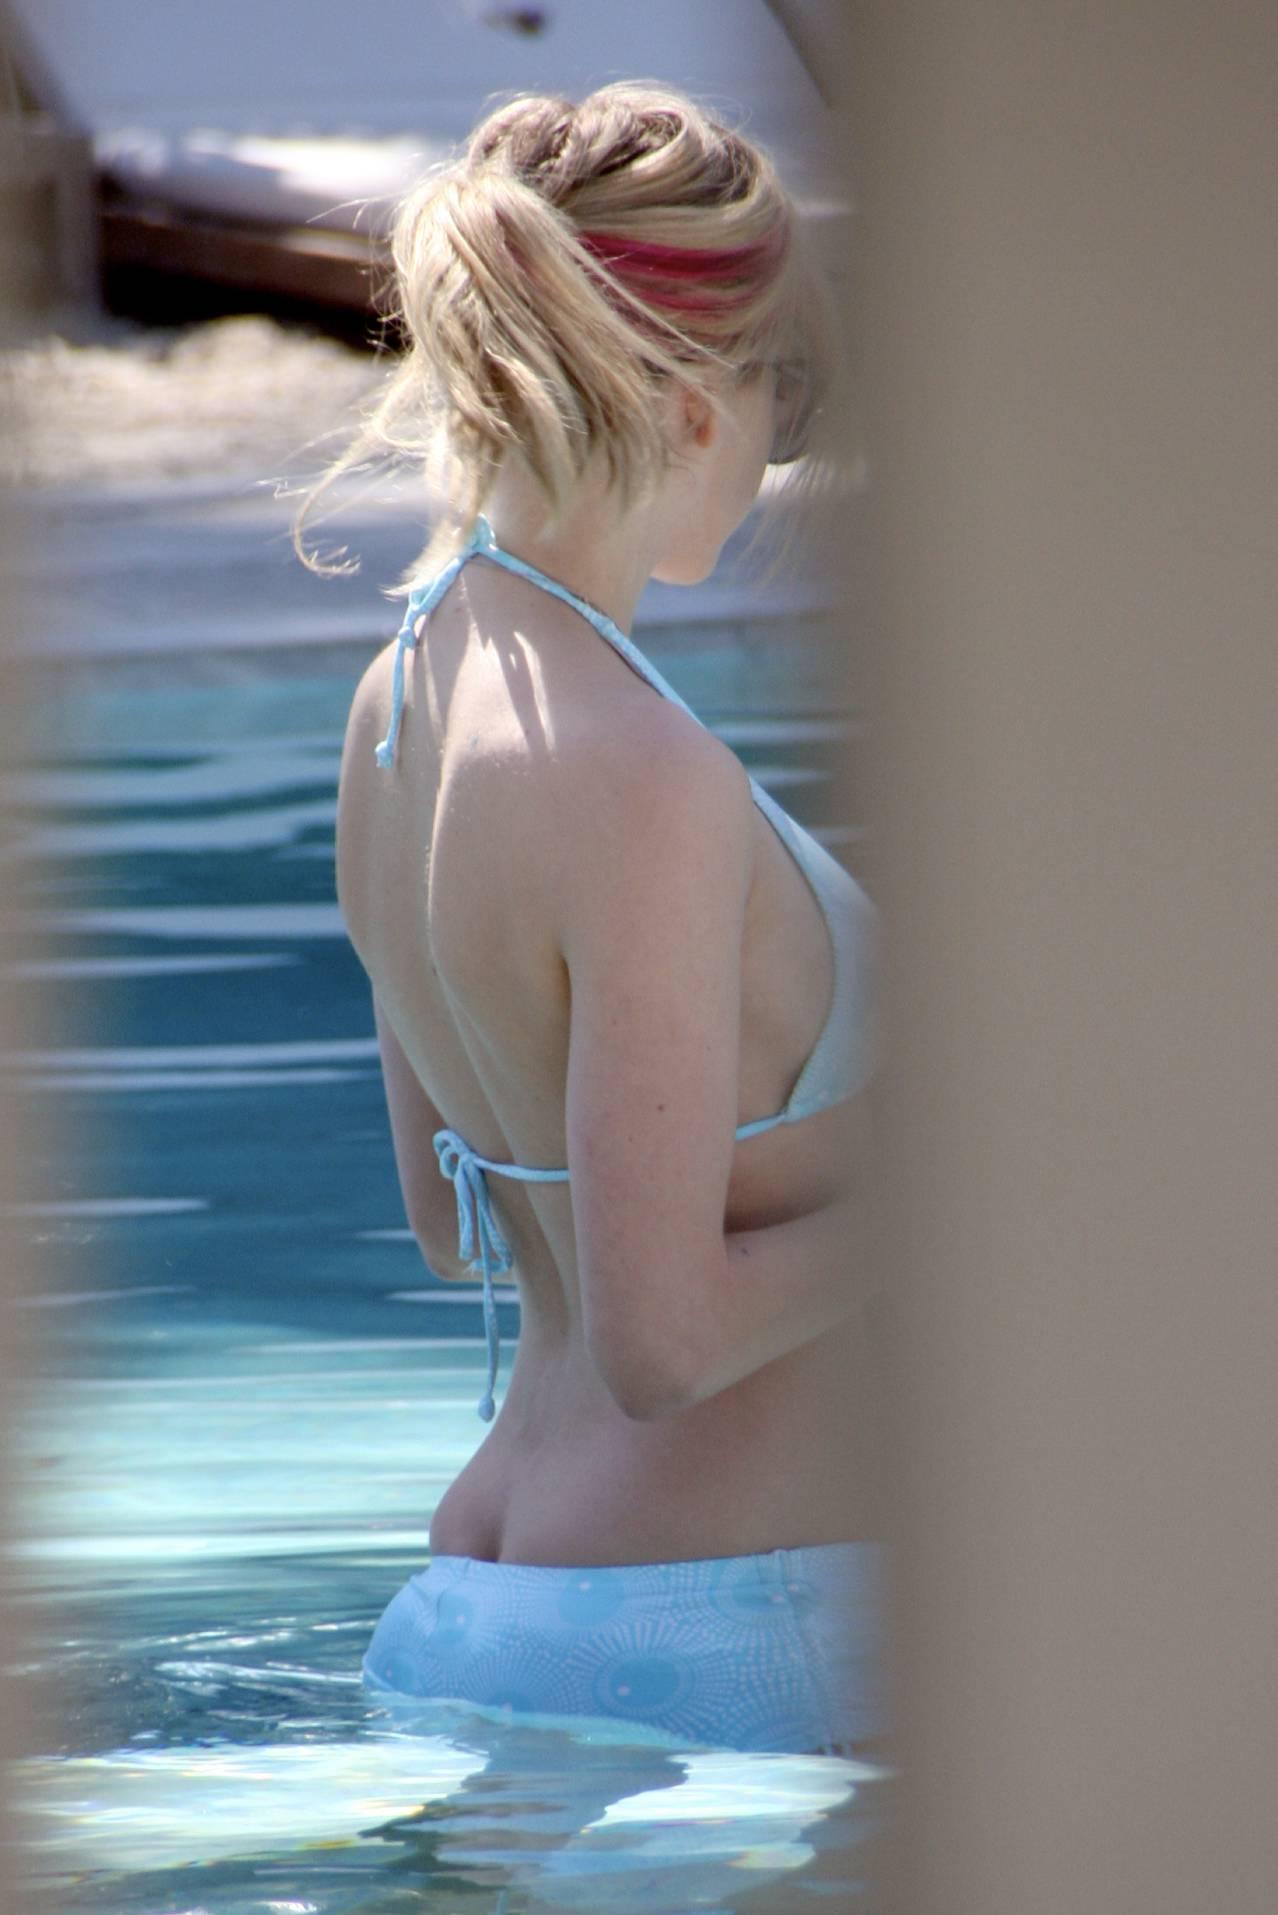 Avril Lavigne leaked nude